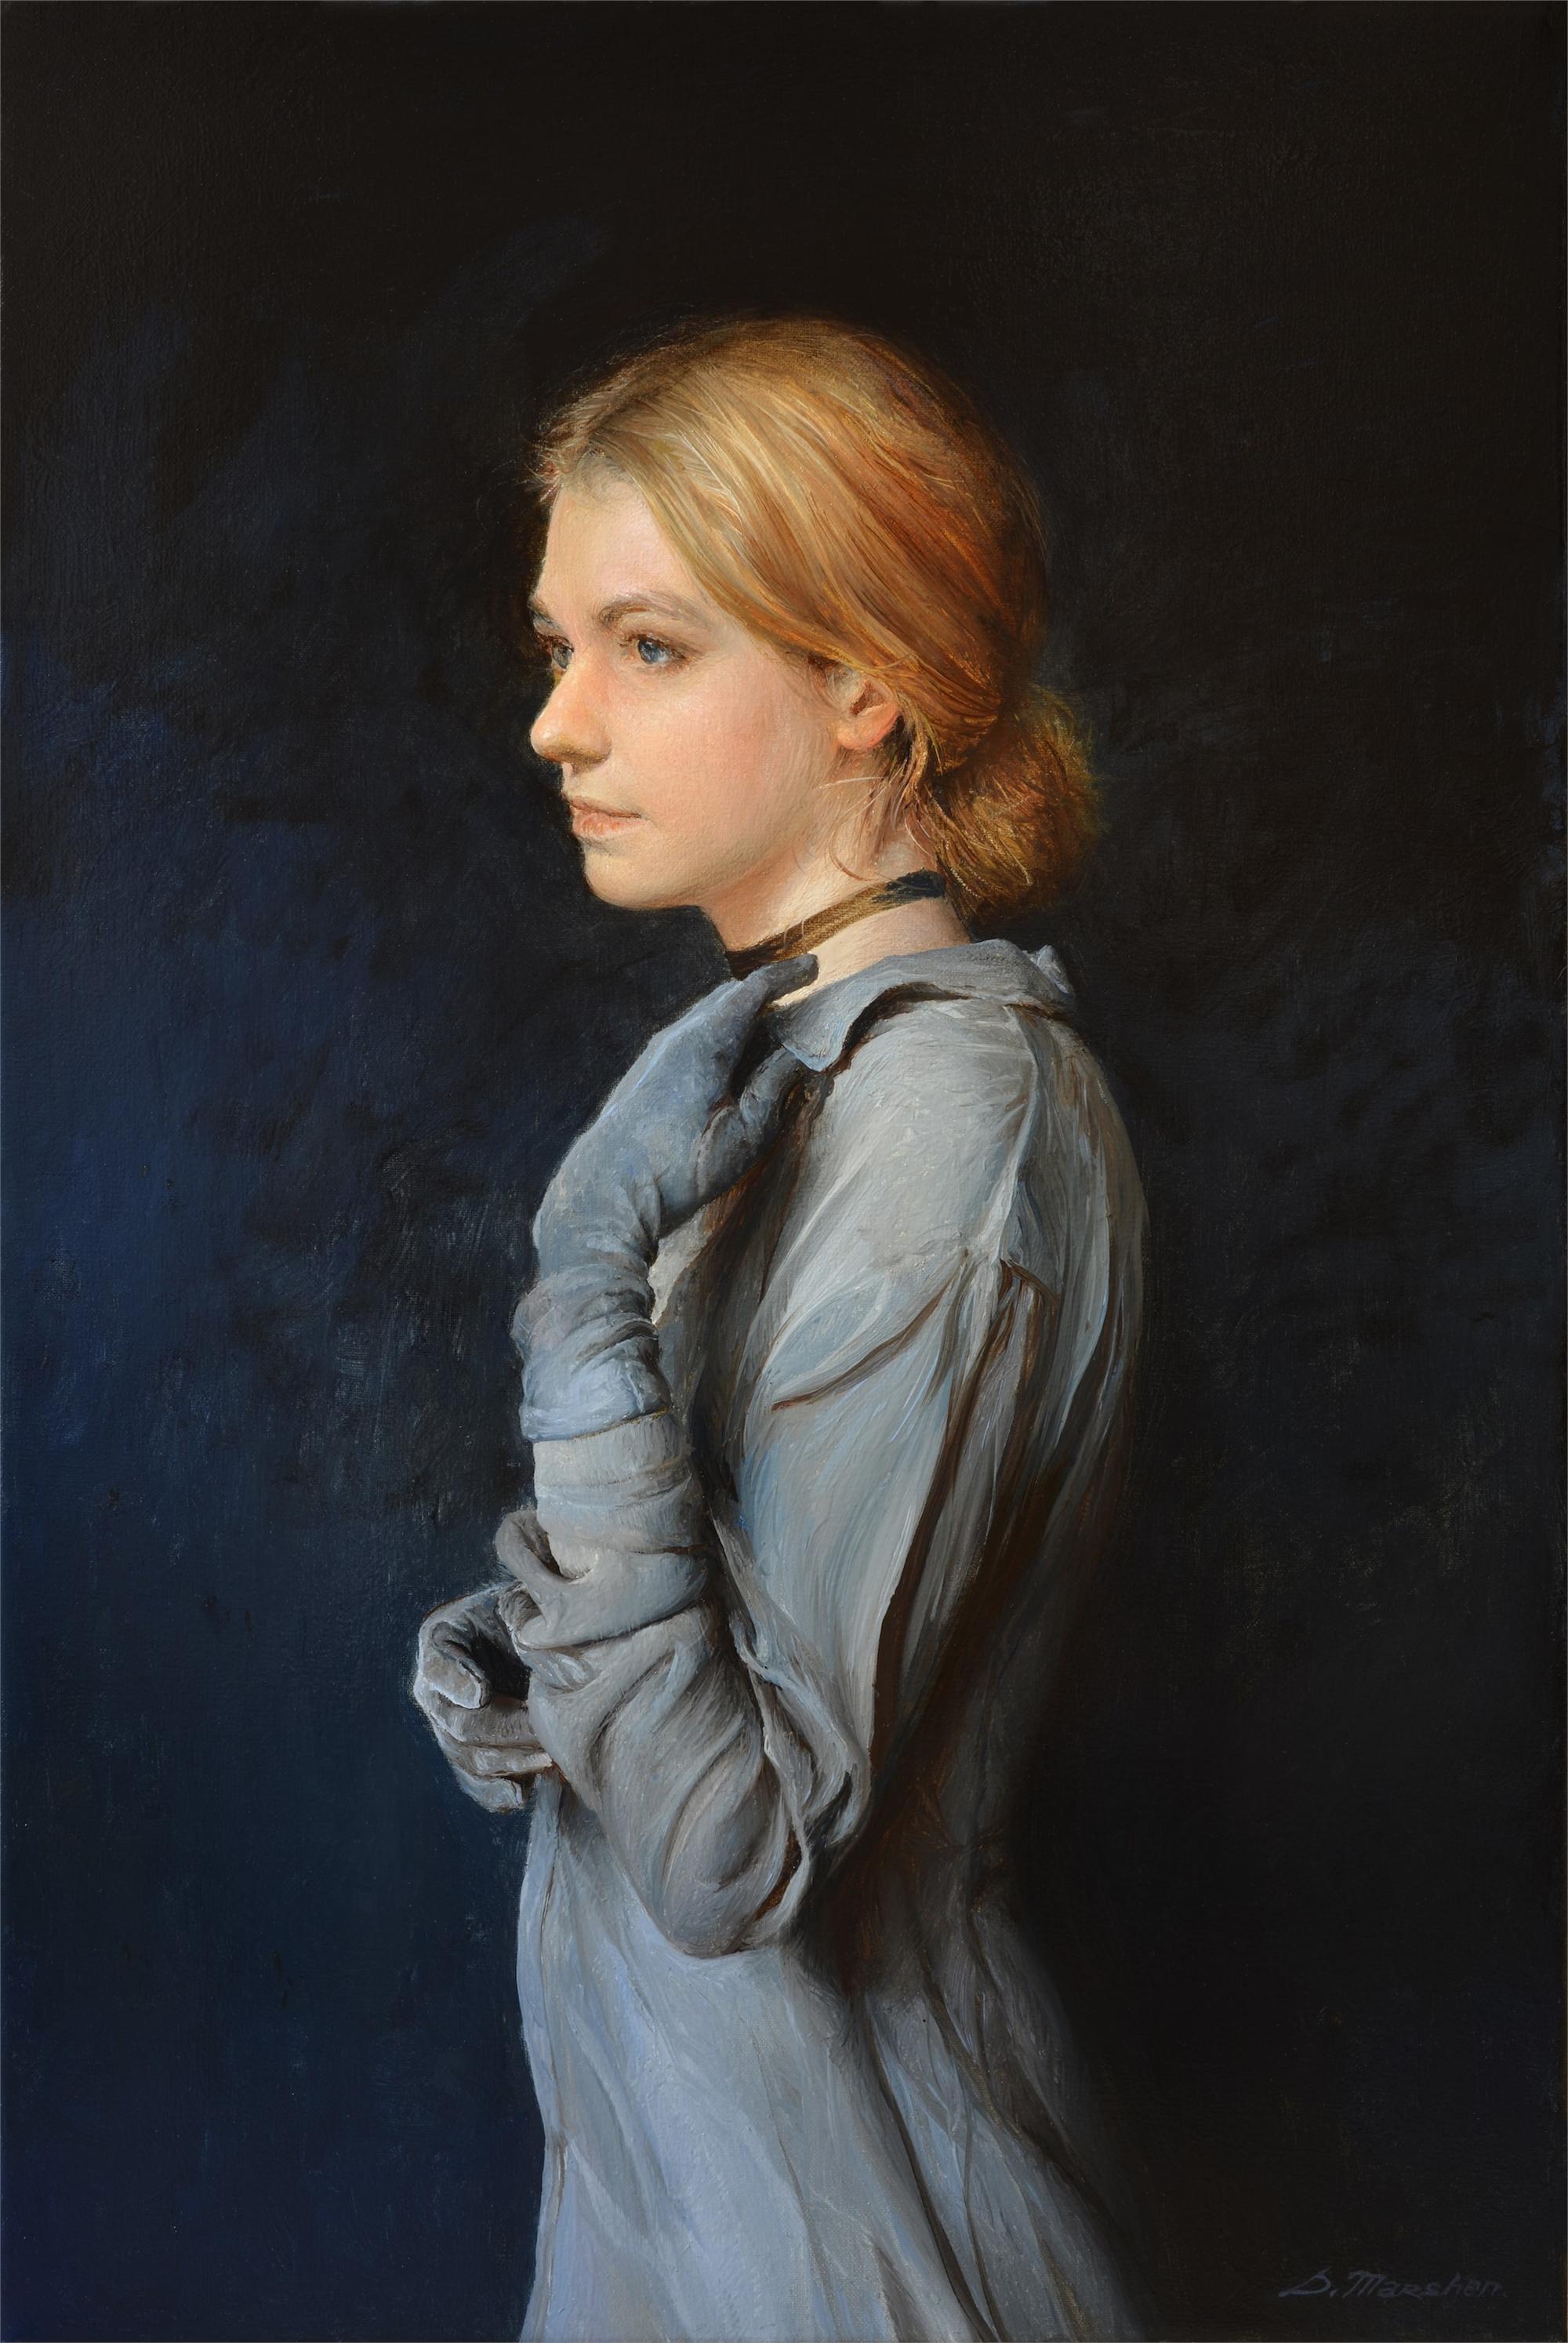 Girl in Gloves by Serge Marshennikov